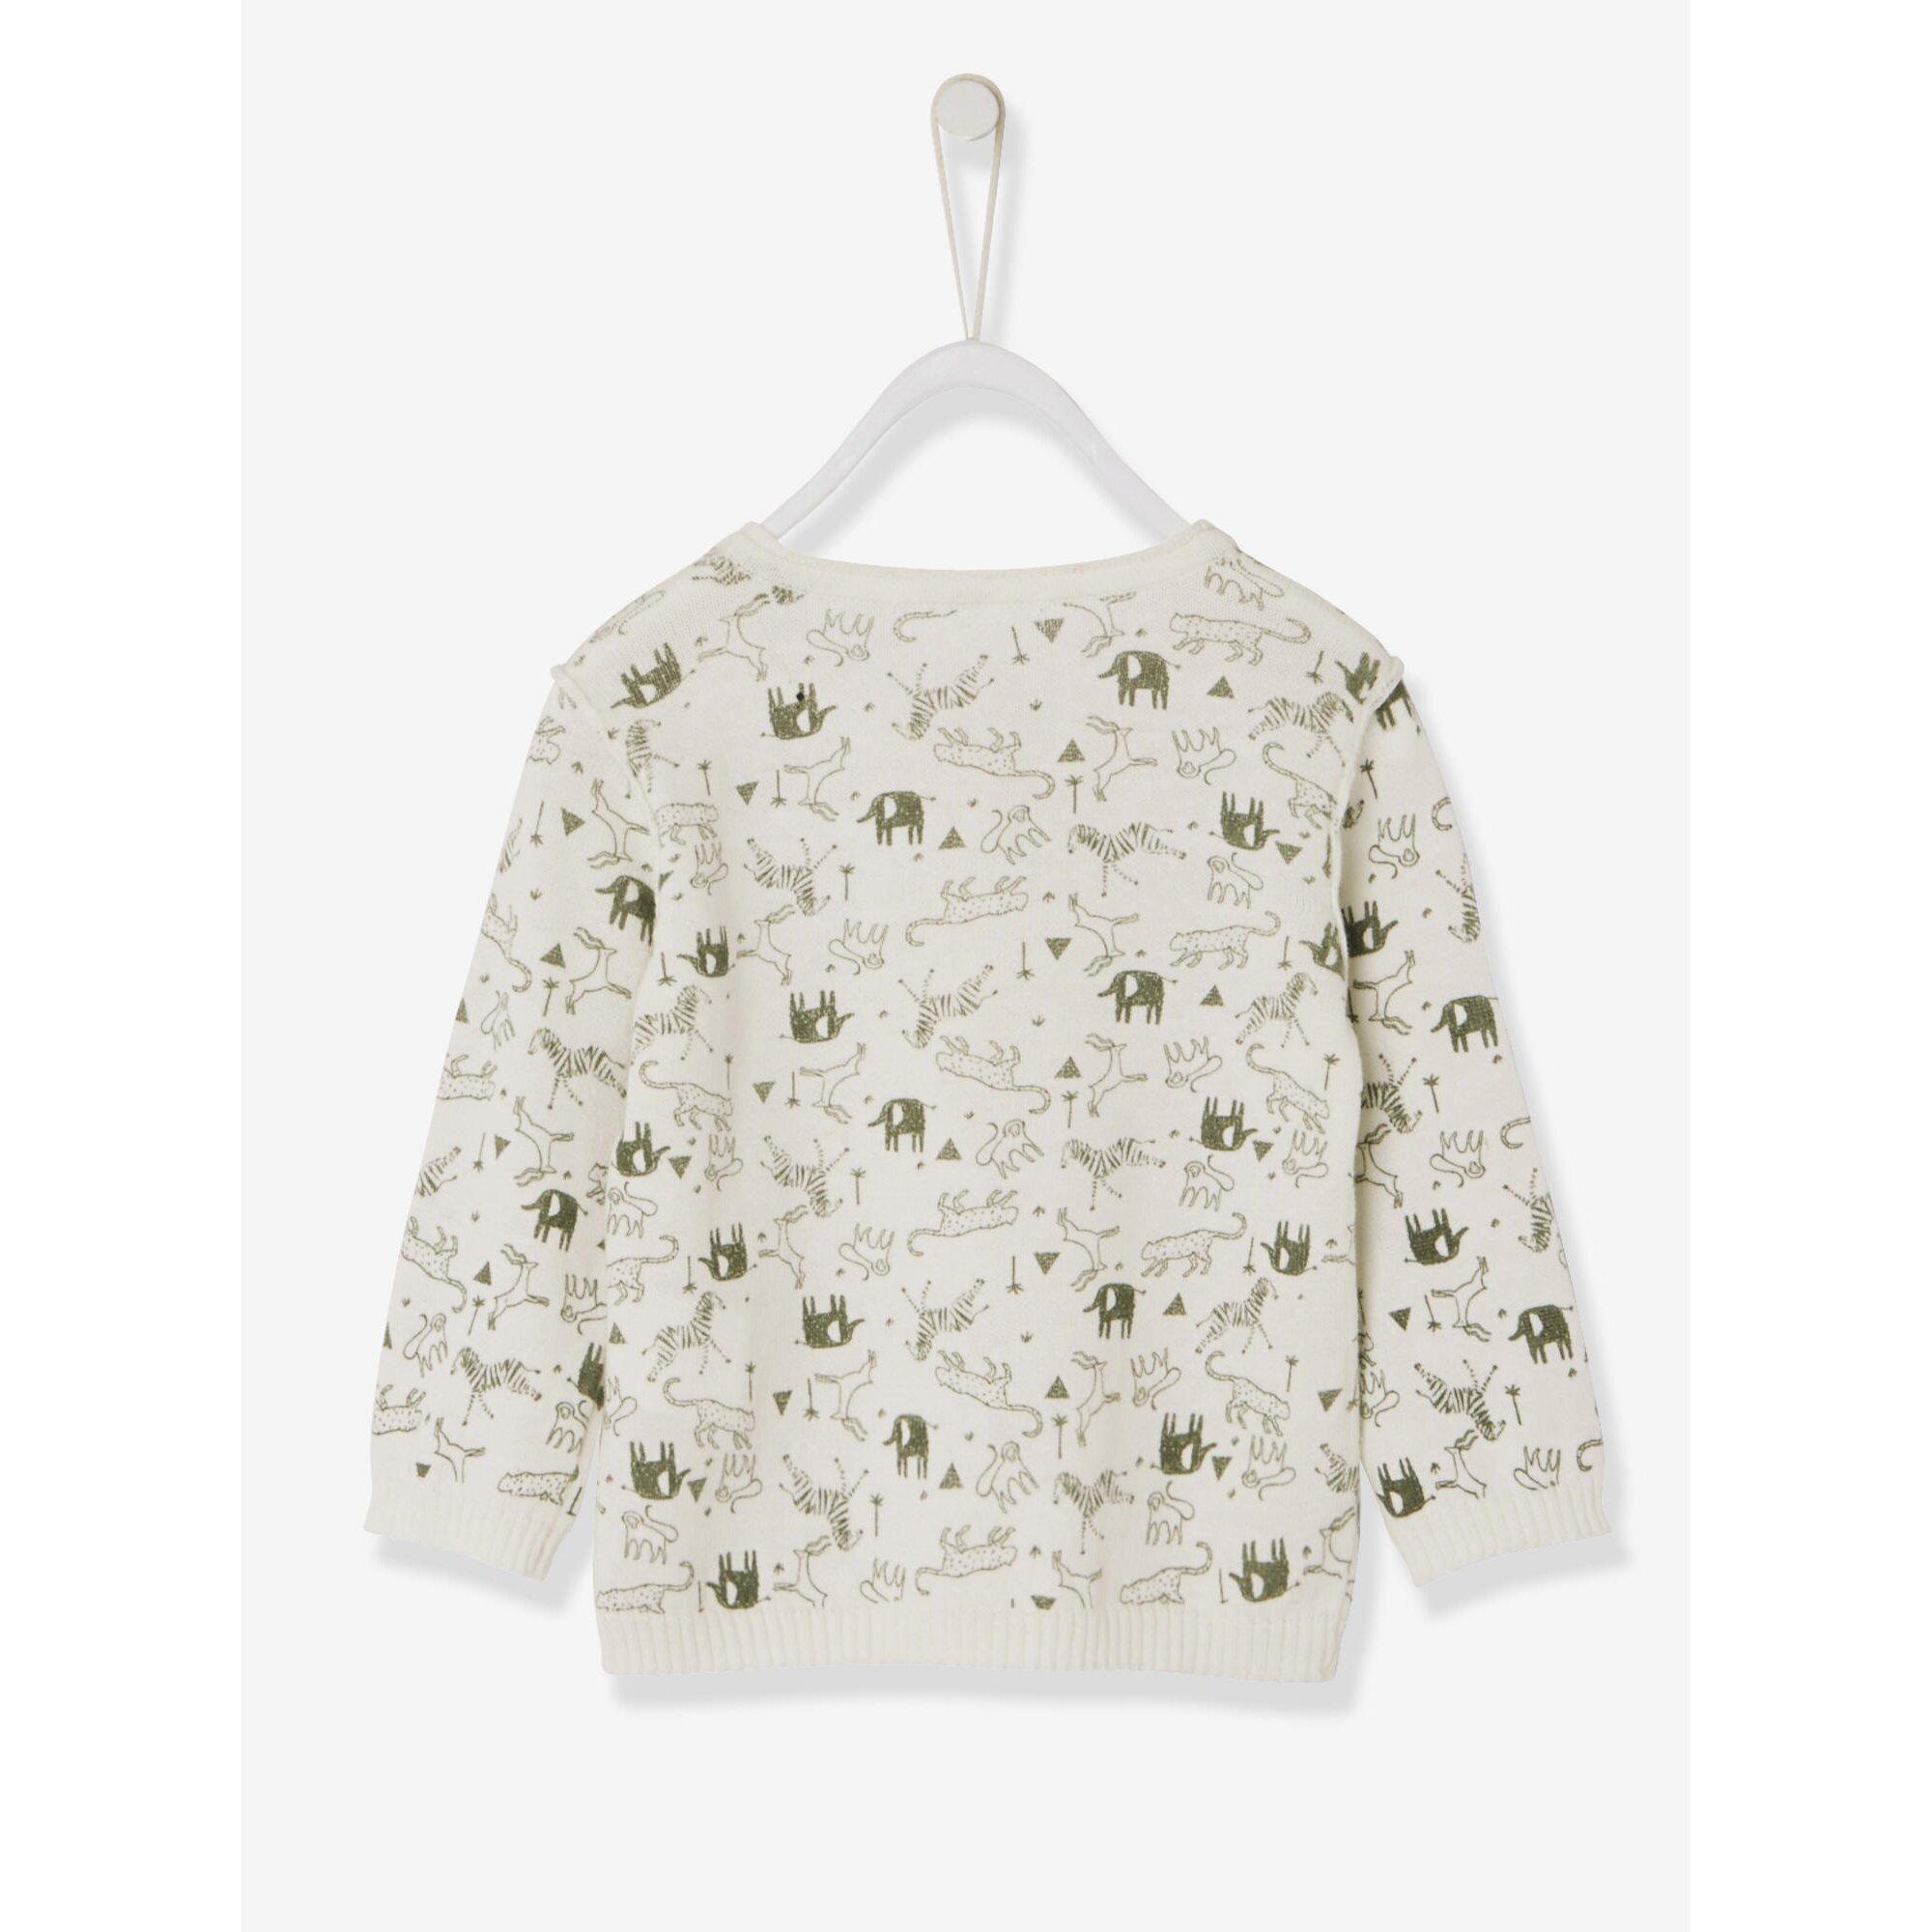 vertbaudet-pullover-fur-baby-jungen-baumwolle, 11.19 EUR @ babywalz-de